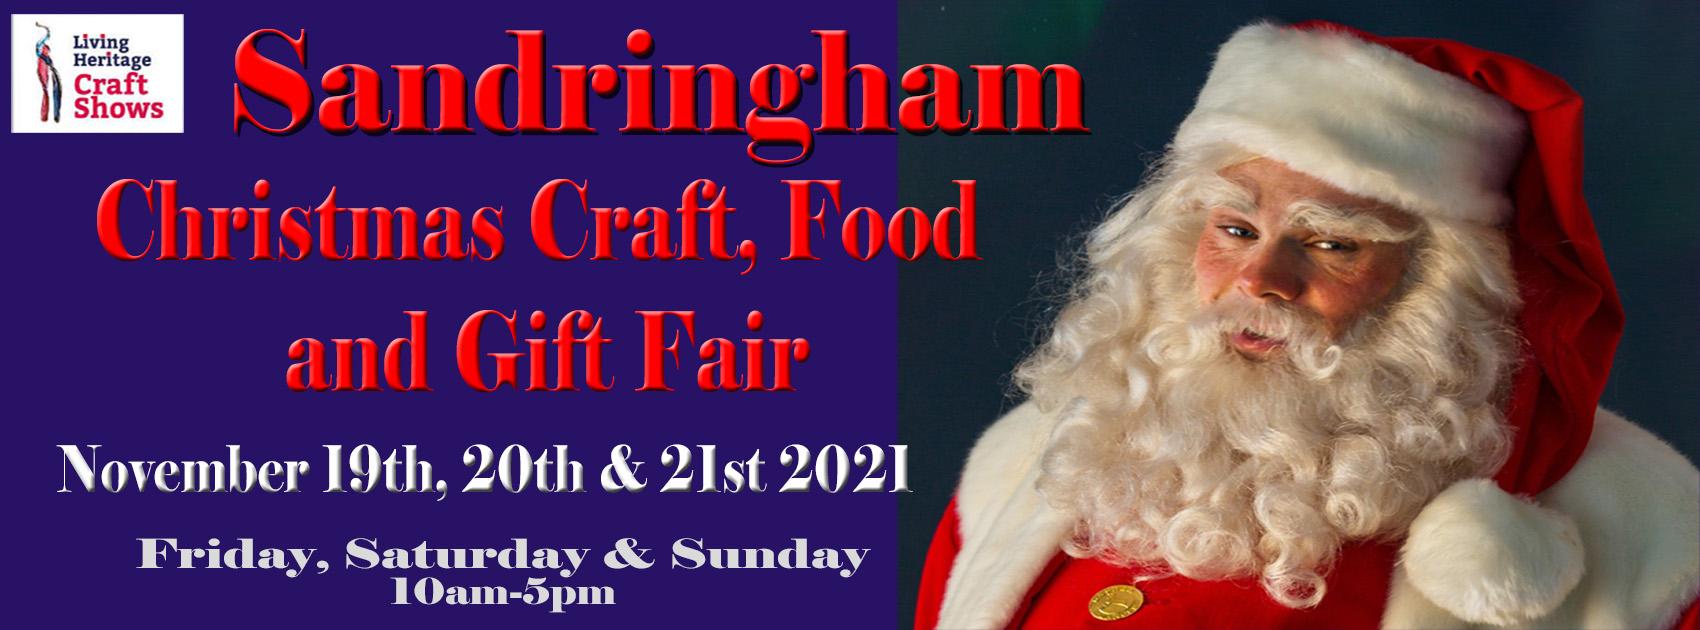 Sandringham Christmas Craft, Food and Gift Fair